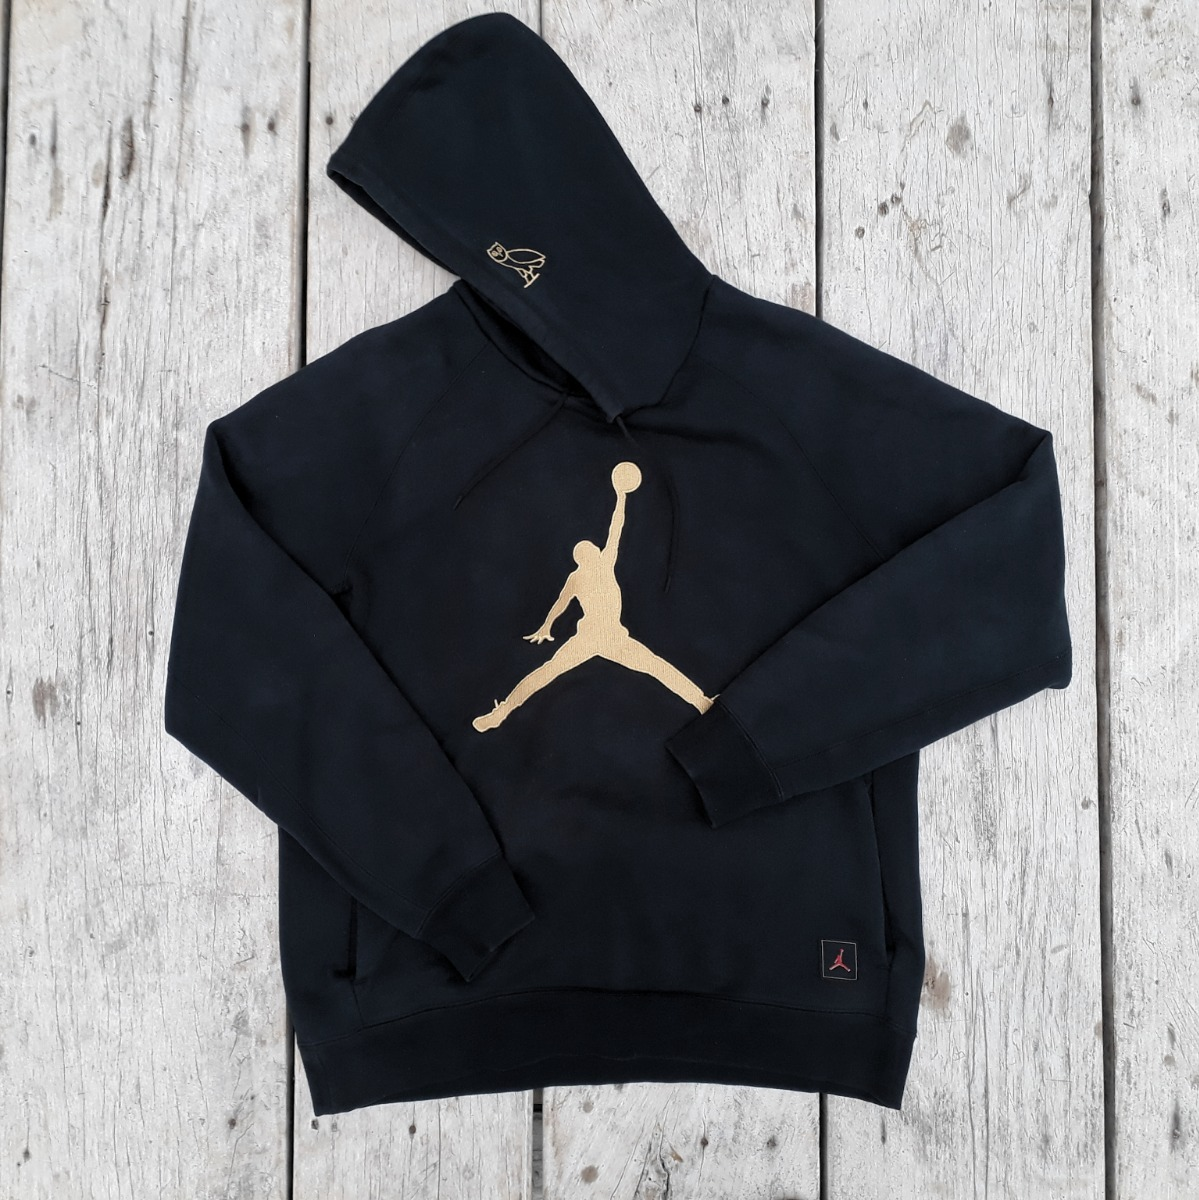 944357d41b2 Moletom Nike Air Jordan X Ovo Drake Octobers Very Own Preto - R ...